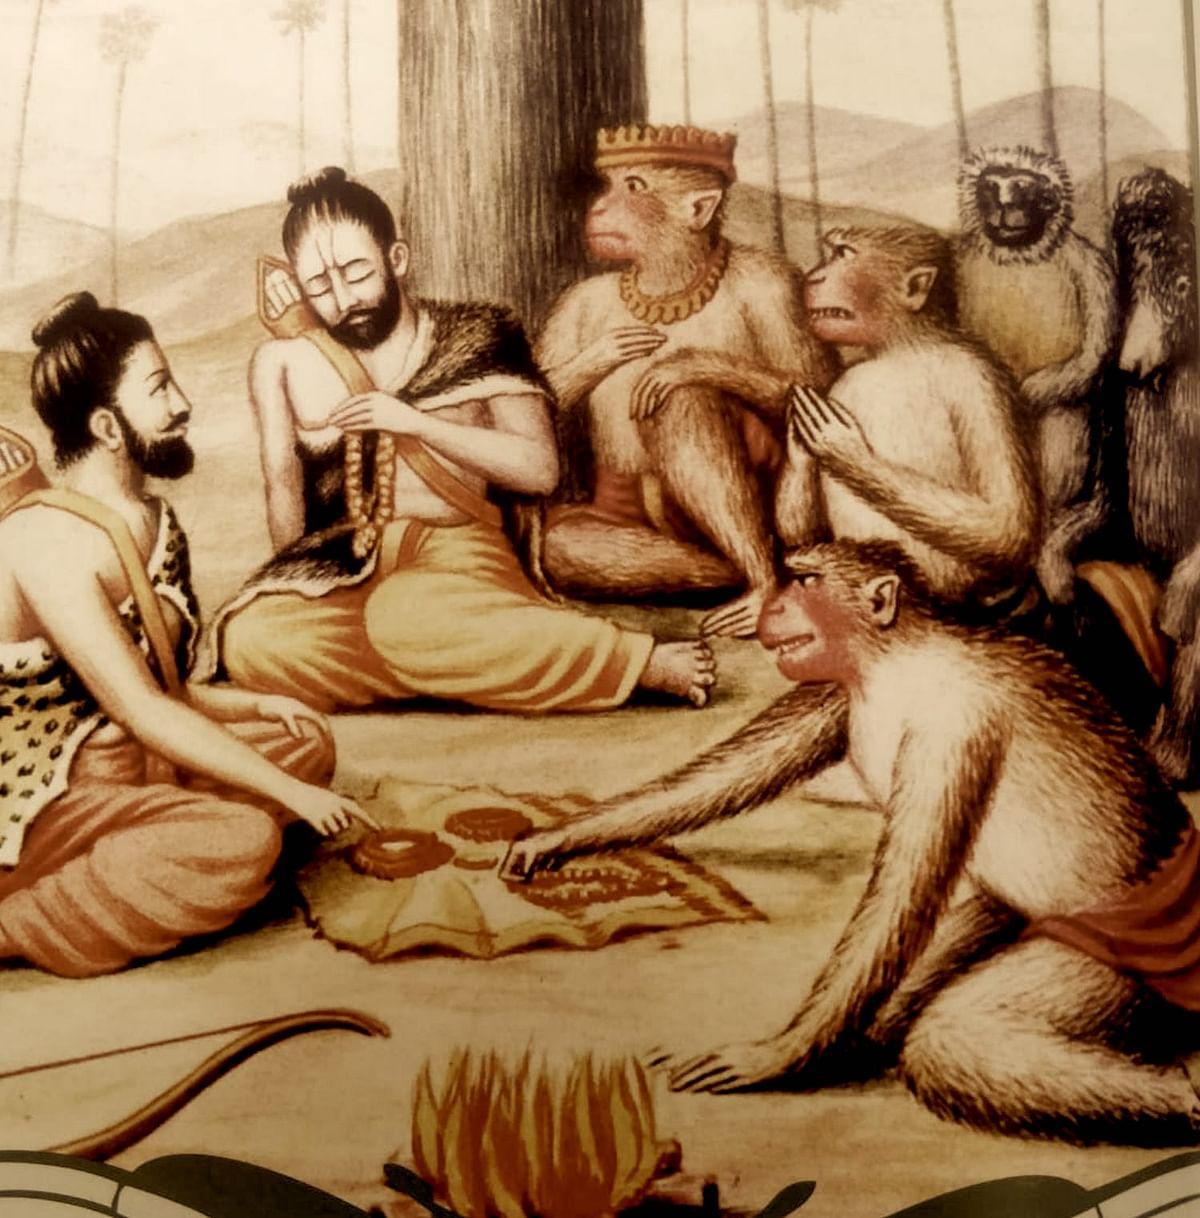 Inculcating the Spirit of Maharshi Valmiki on this Deepavali